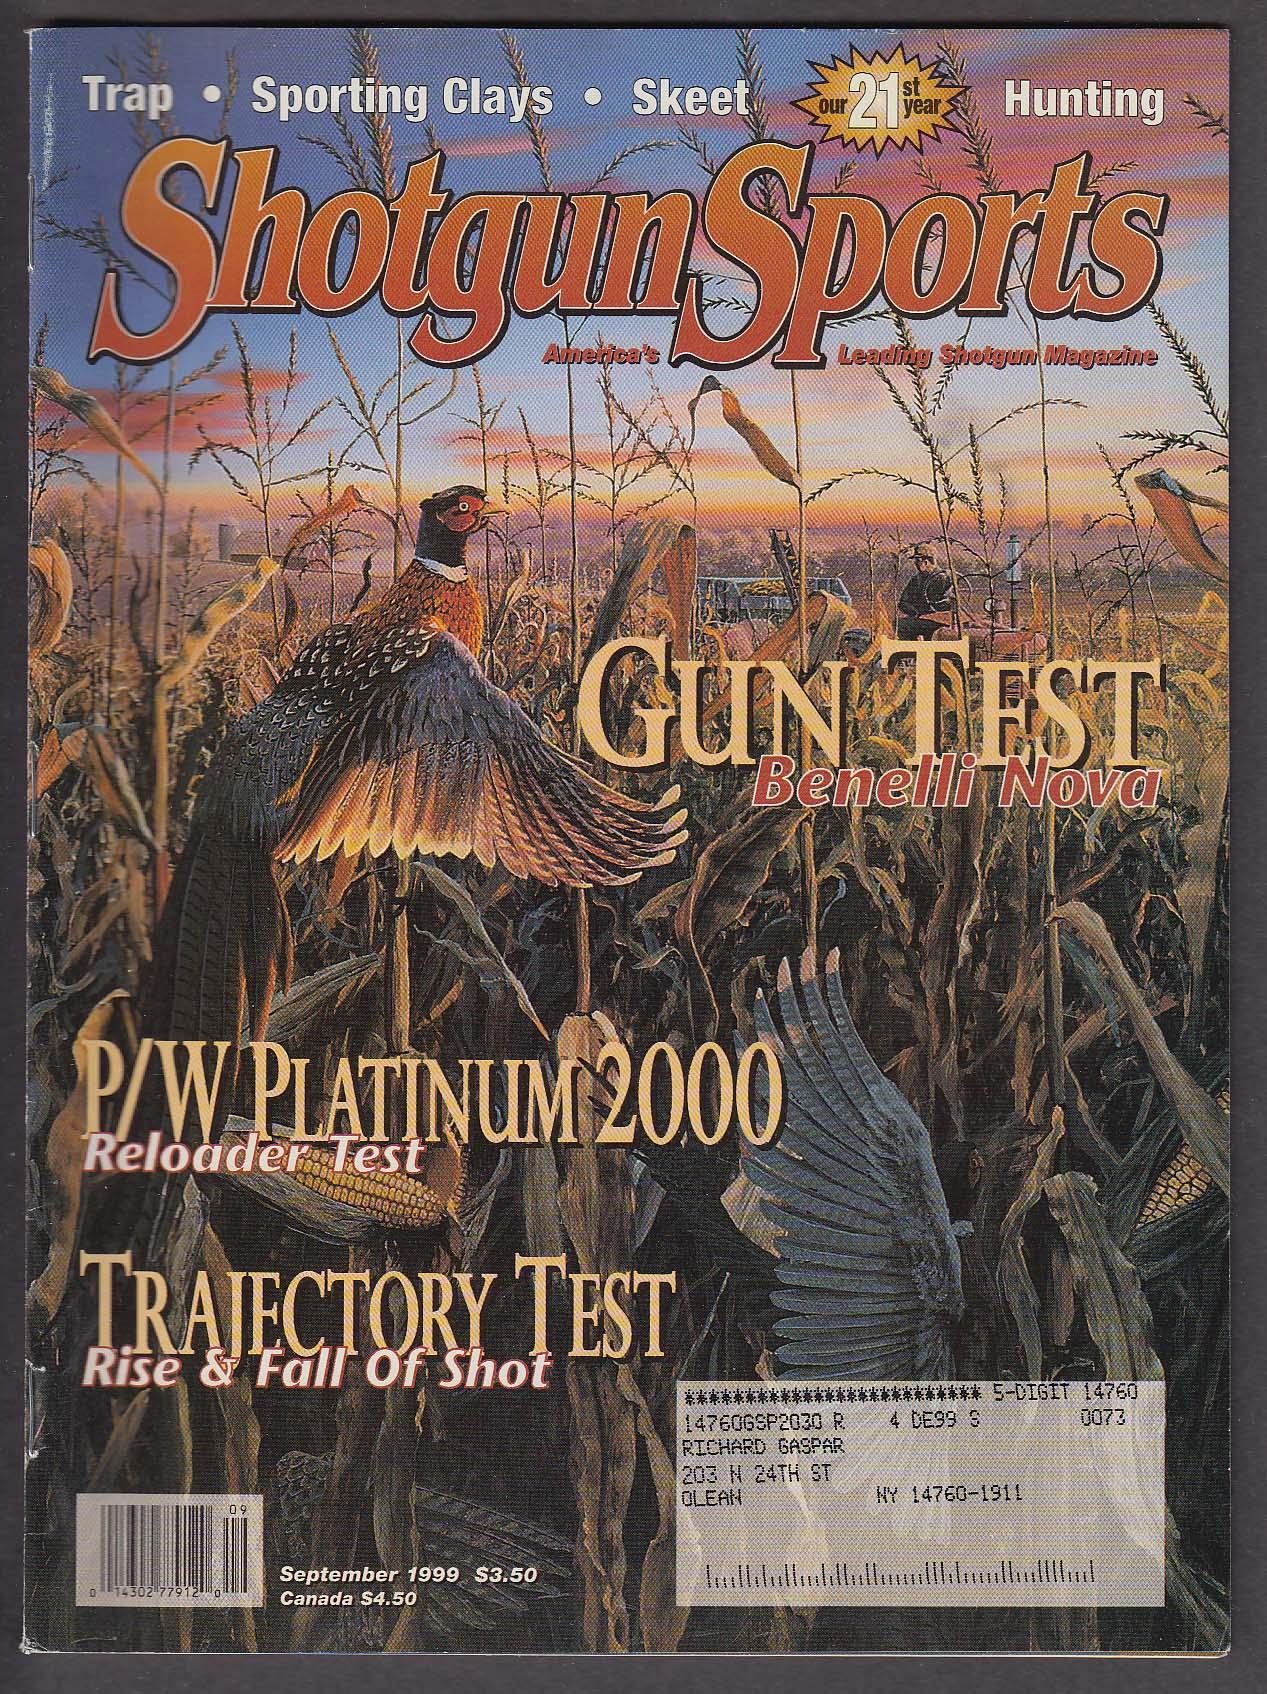 Image for SHOTGUN SPORTS Benelli Nova P/W Platinum 2000 28 Gauge Cabela + 9 1999